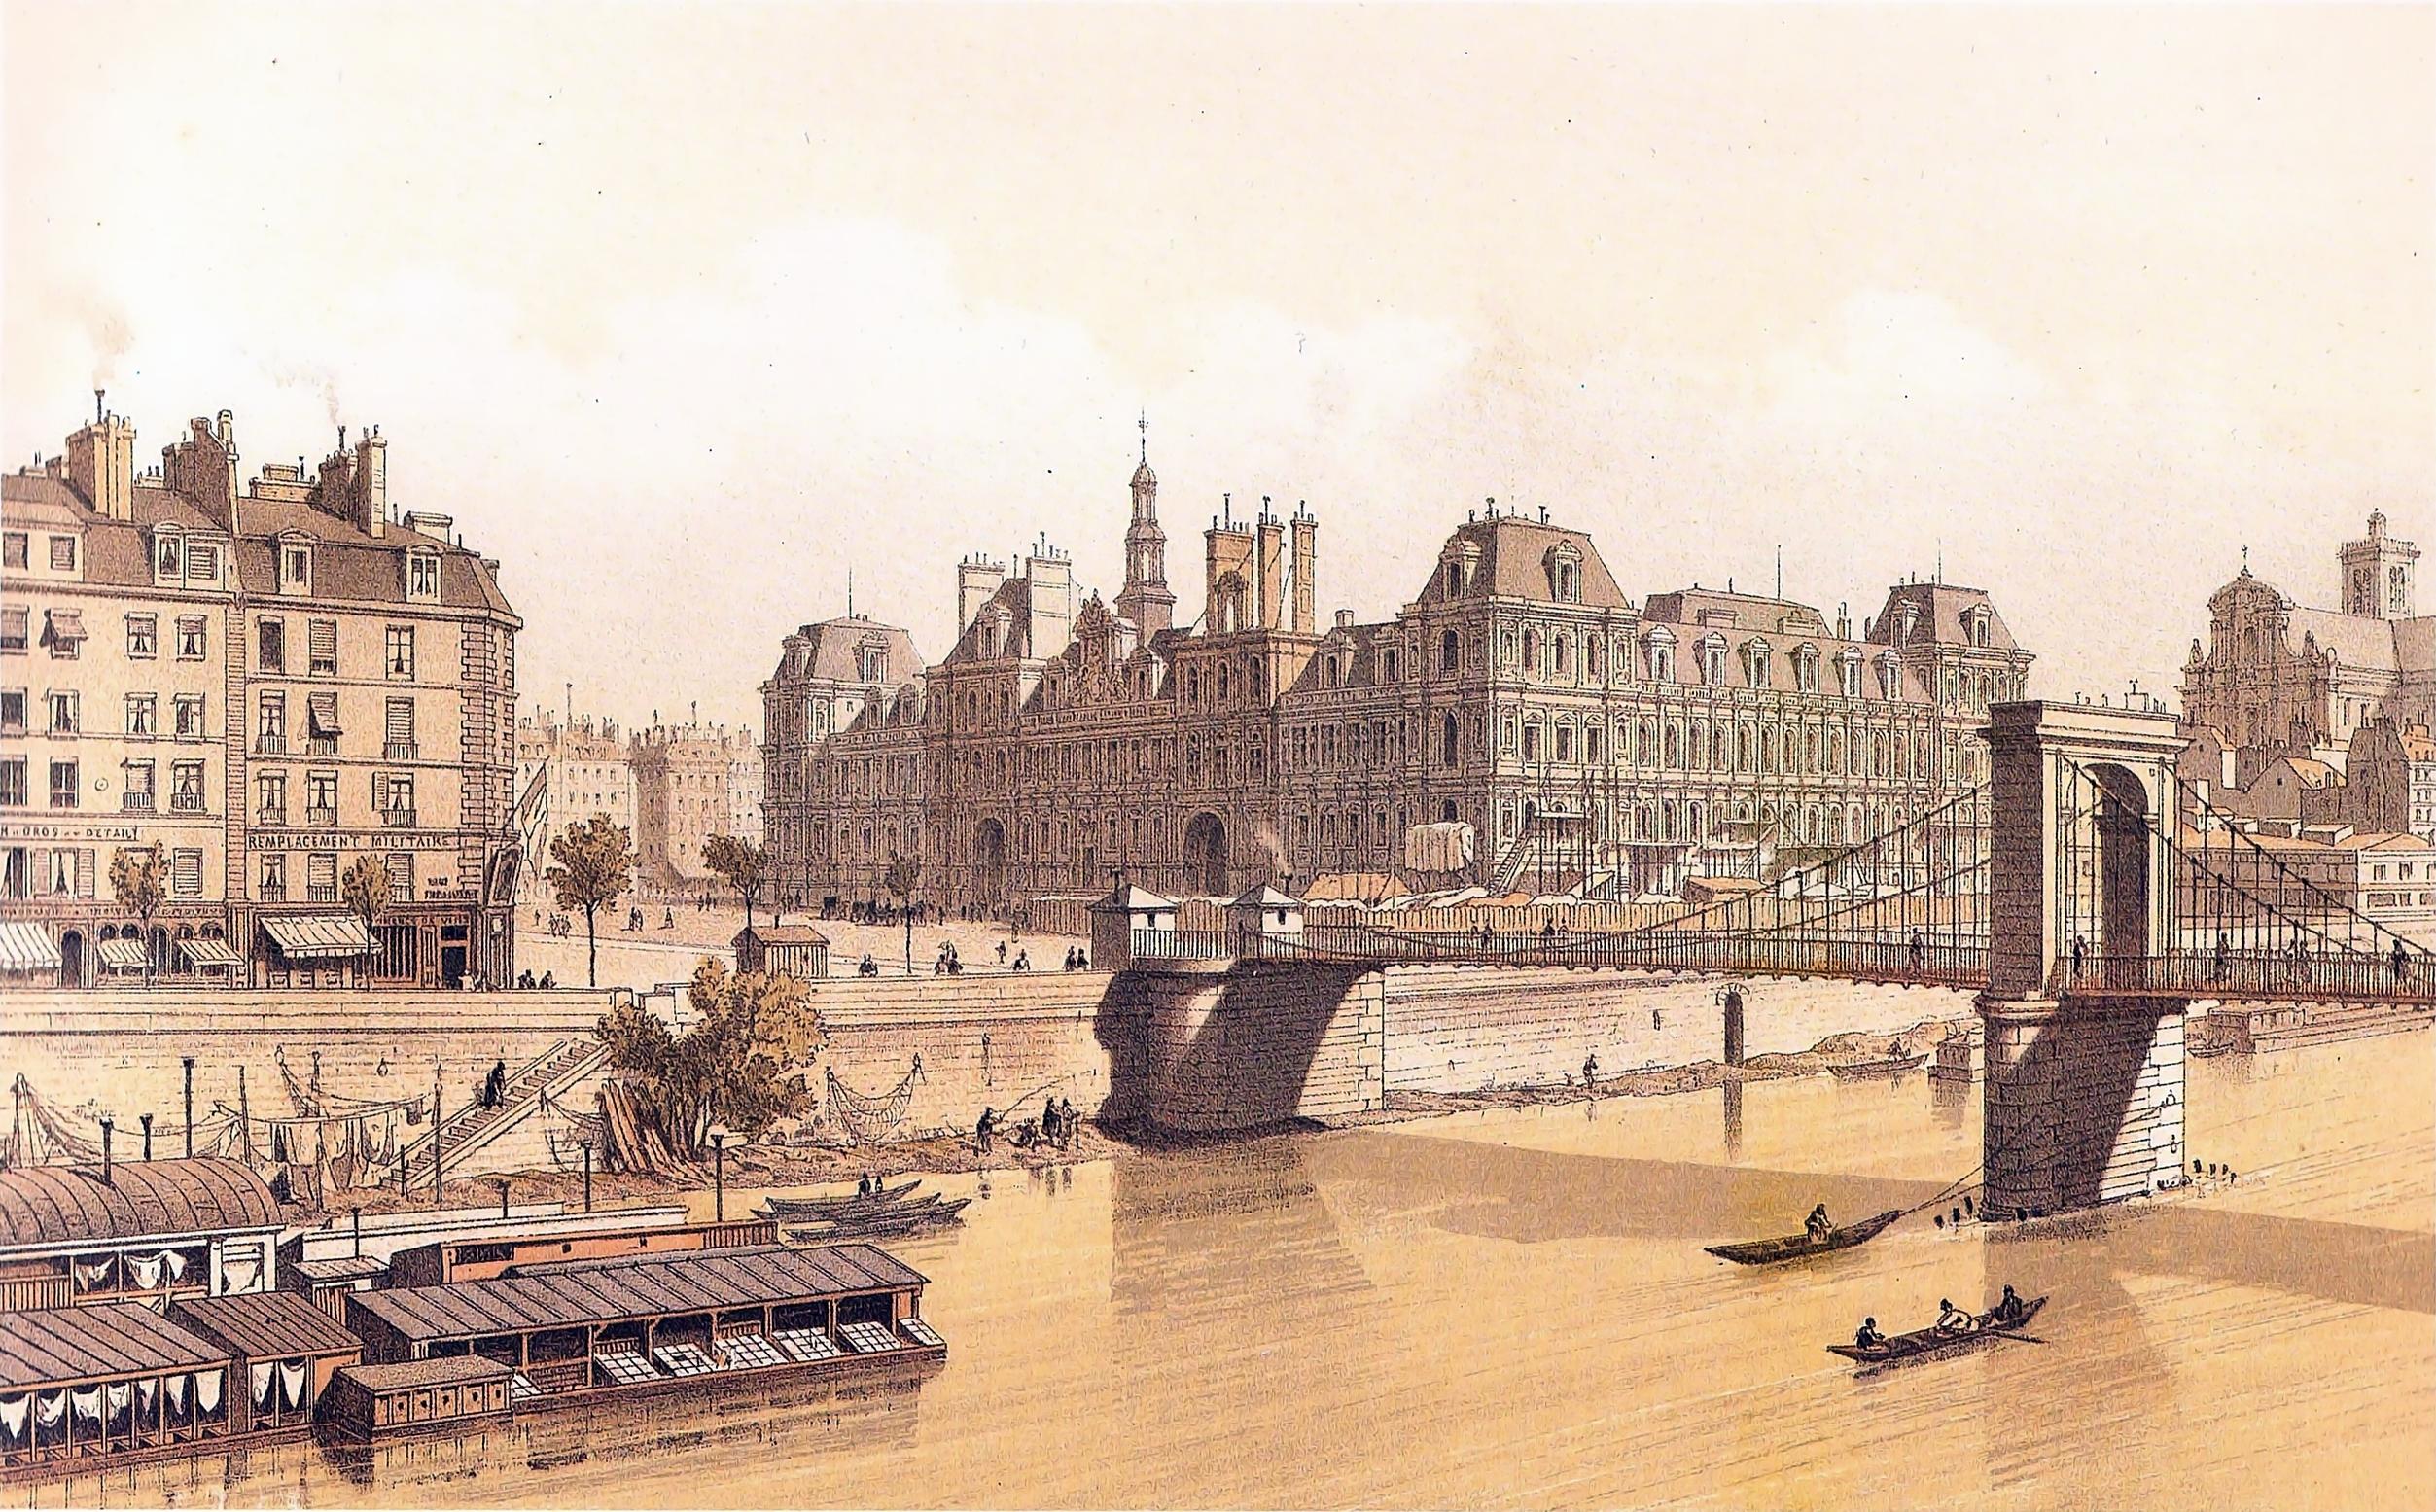 File:Hotel de Ville Paris Hoffbauer 1842.jpg